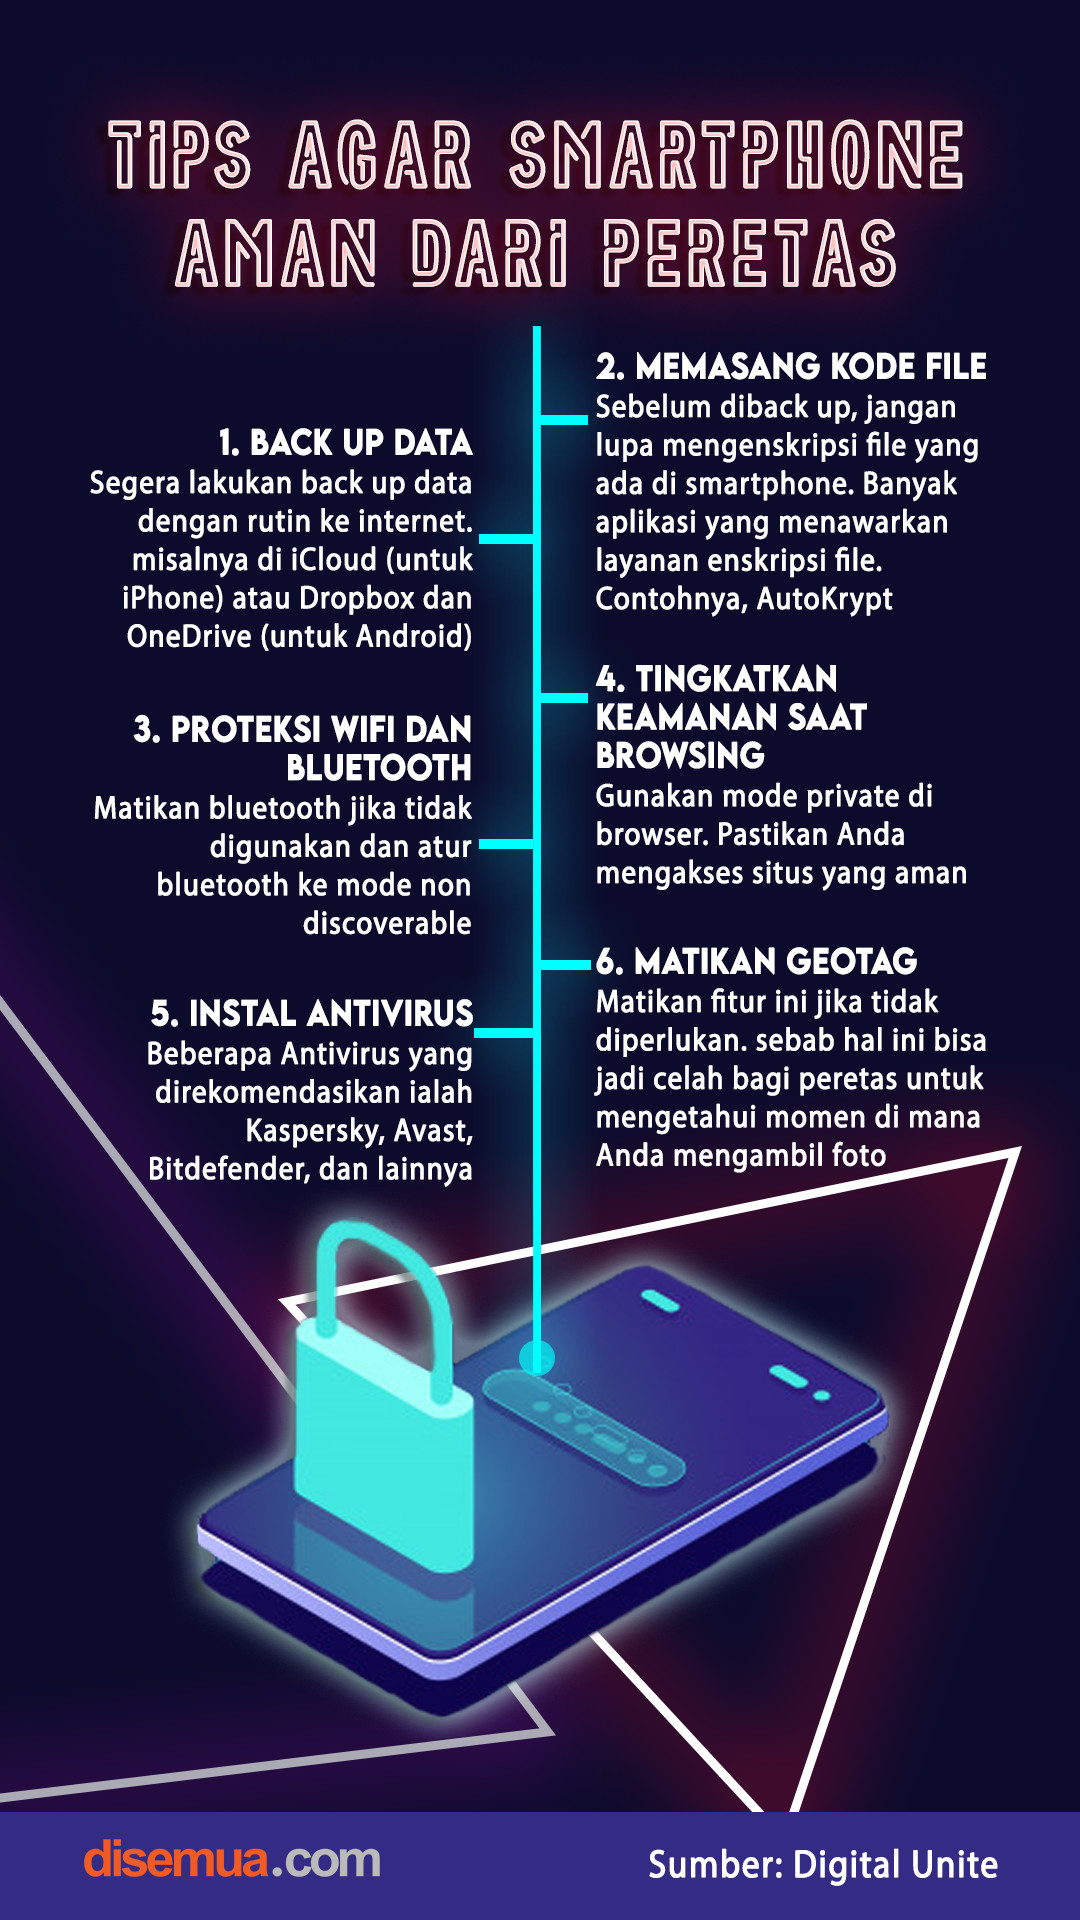 Tips Agar Smartphone Aman dari Peretas